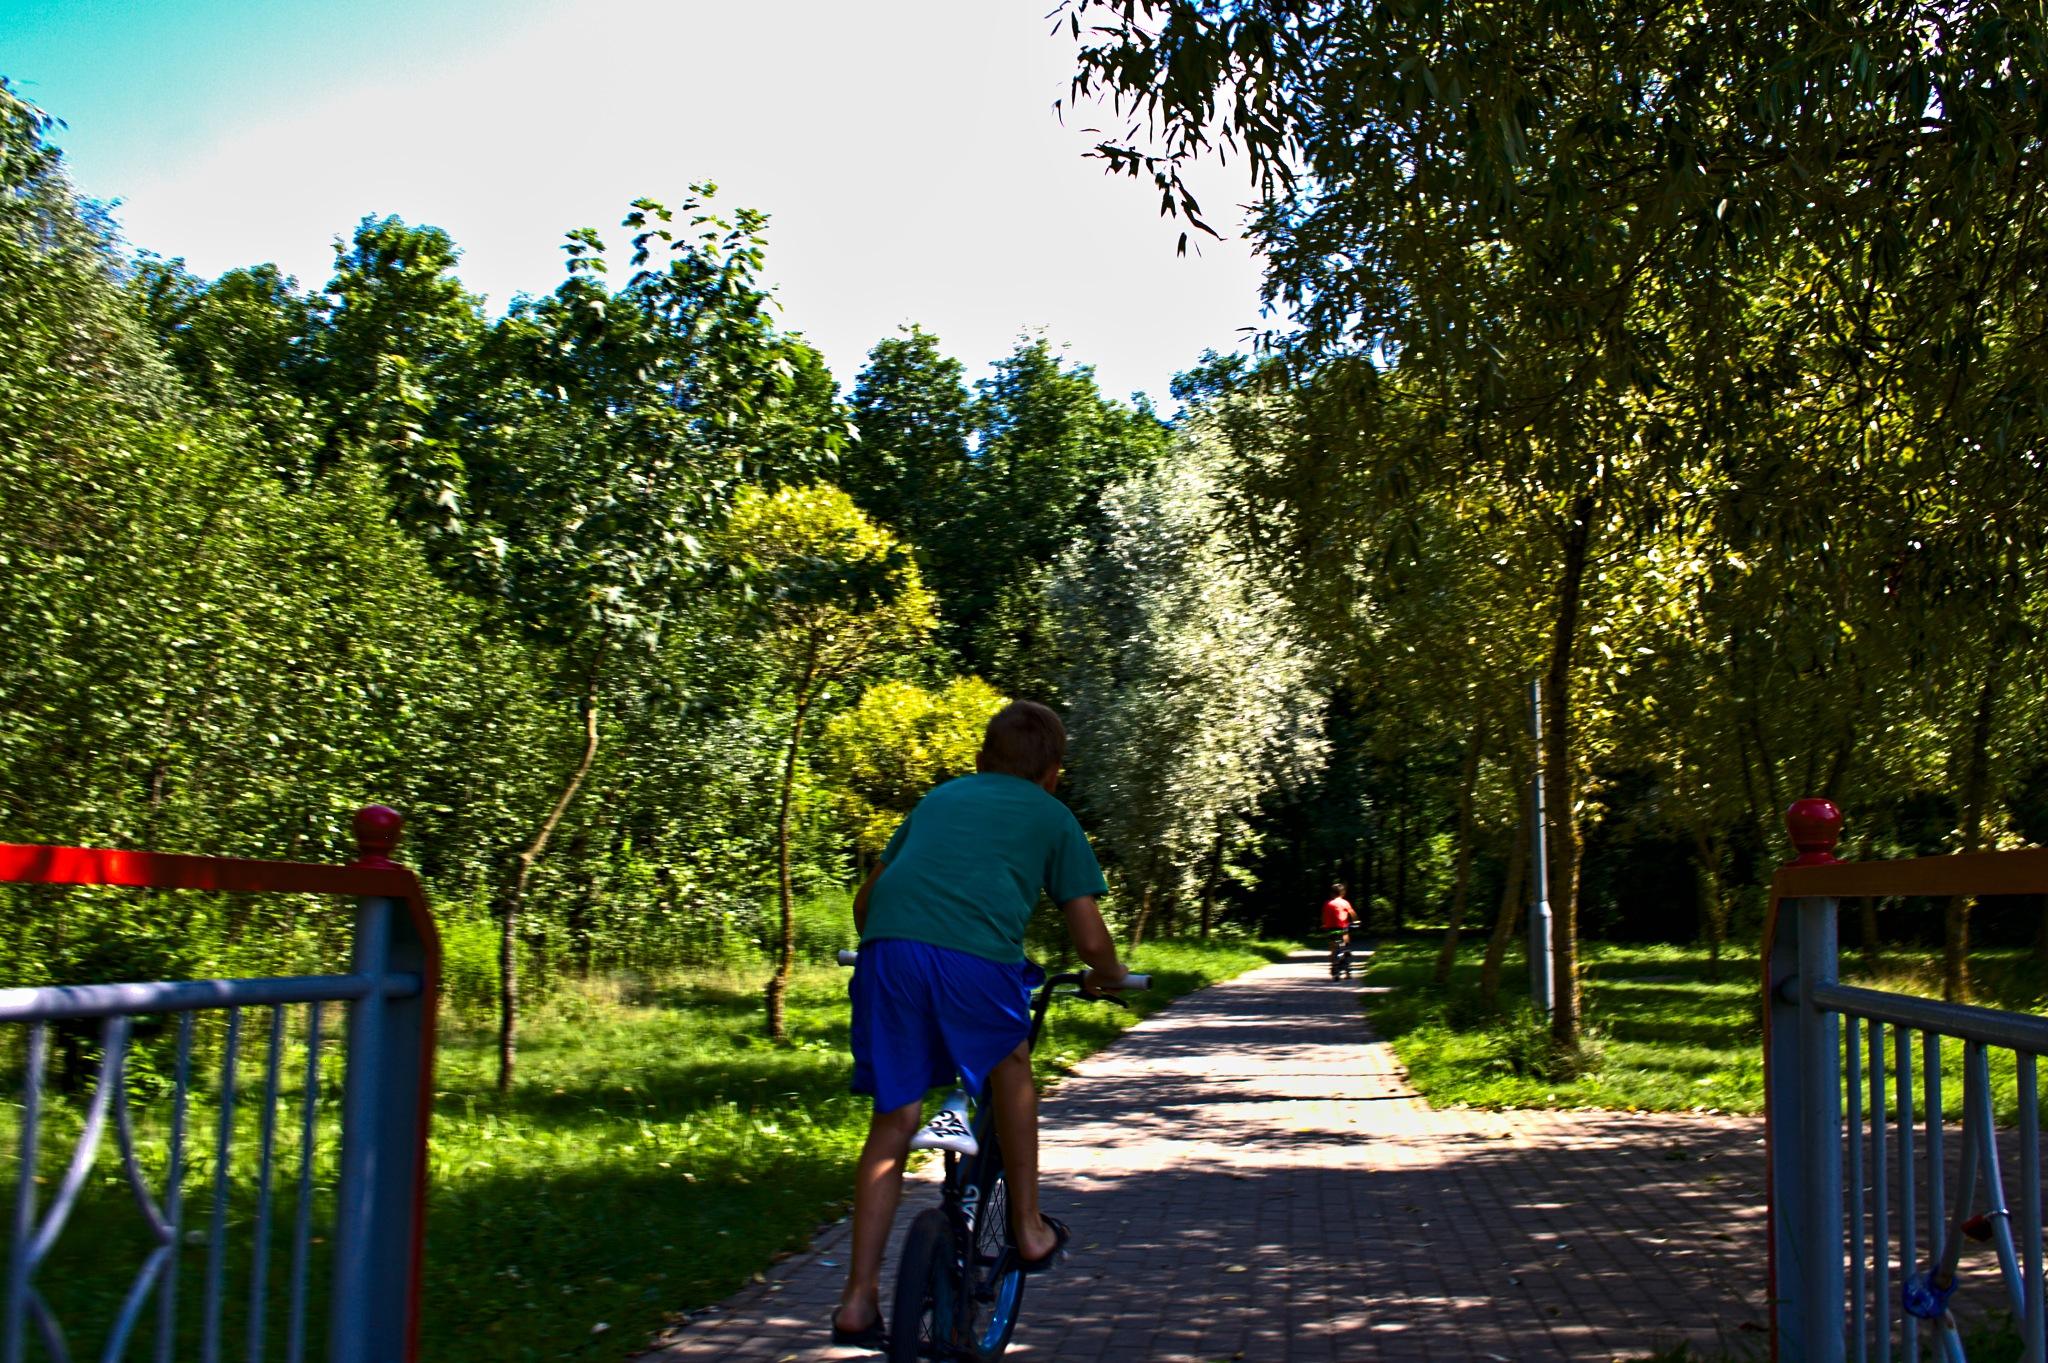 Riding in park by Евгений Козлов